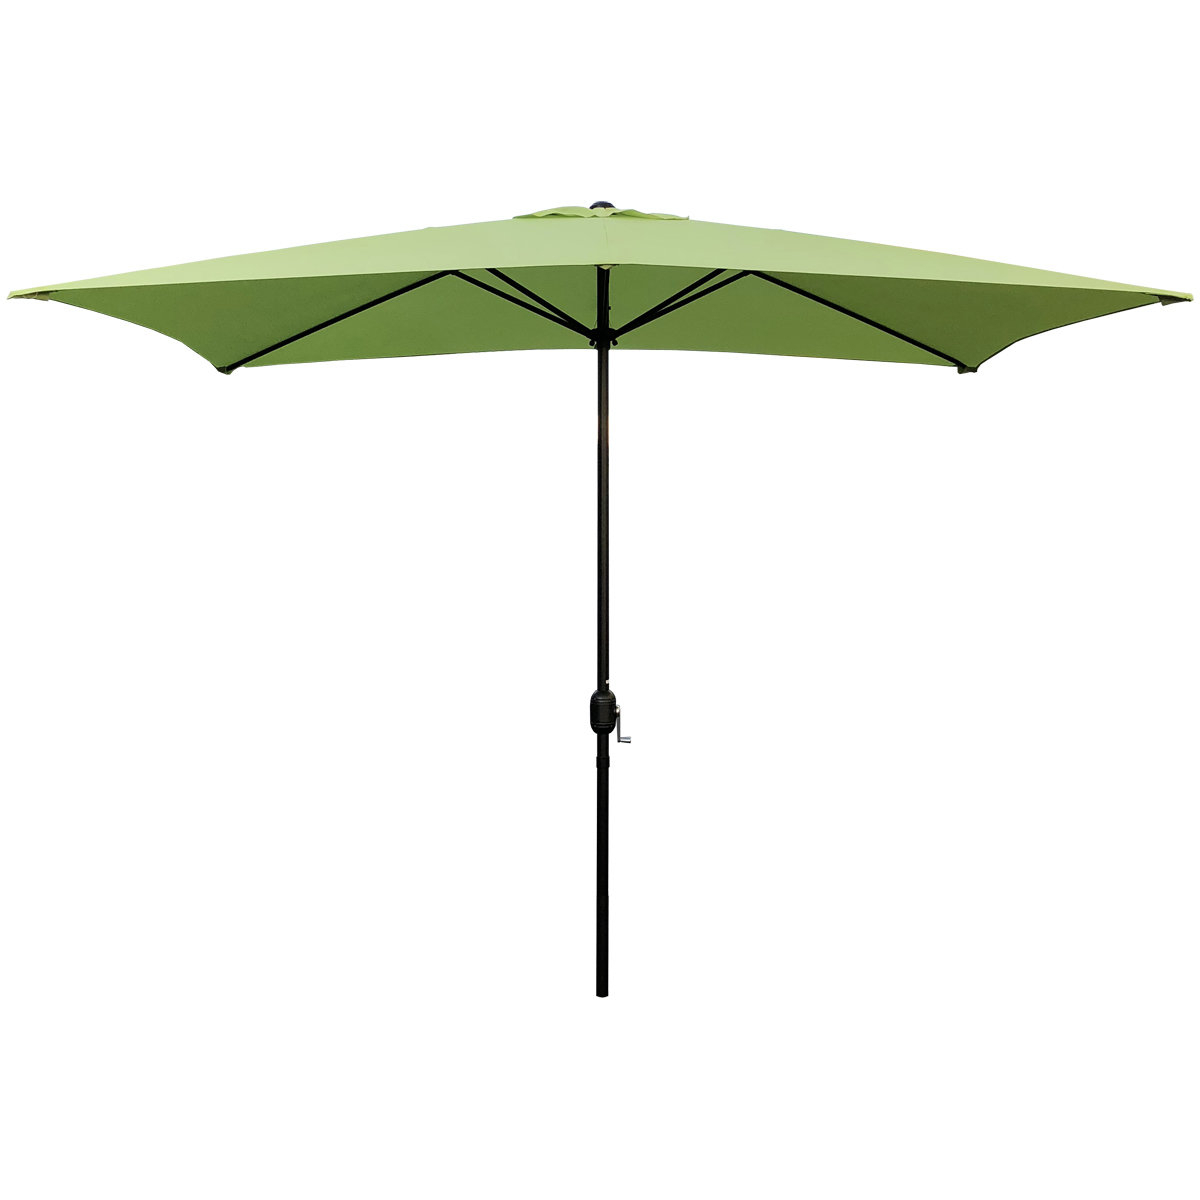 2020 Bradford Patio Market Umbrellas For Hashtag Home Bradford 10' X  (View 1 of 20)